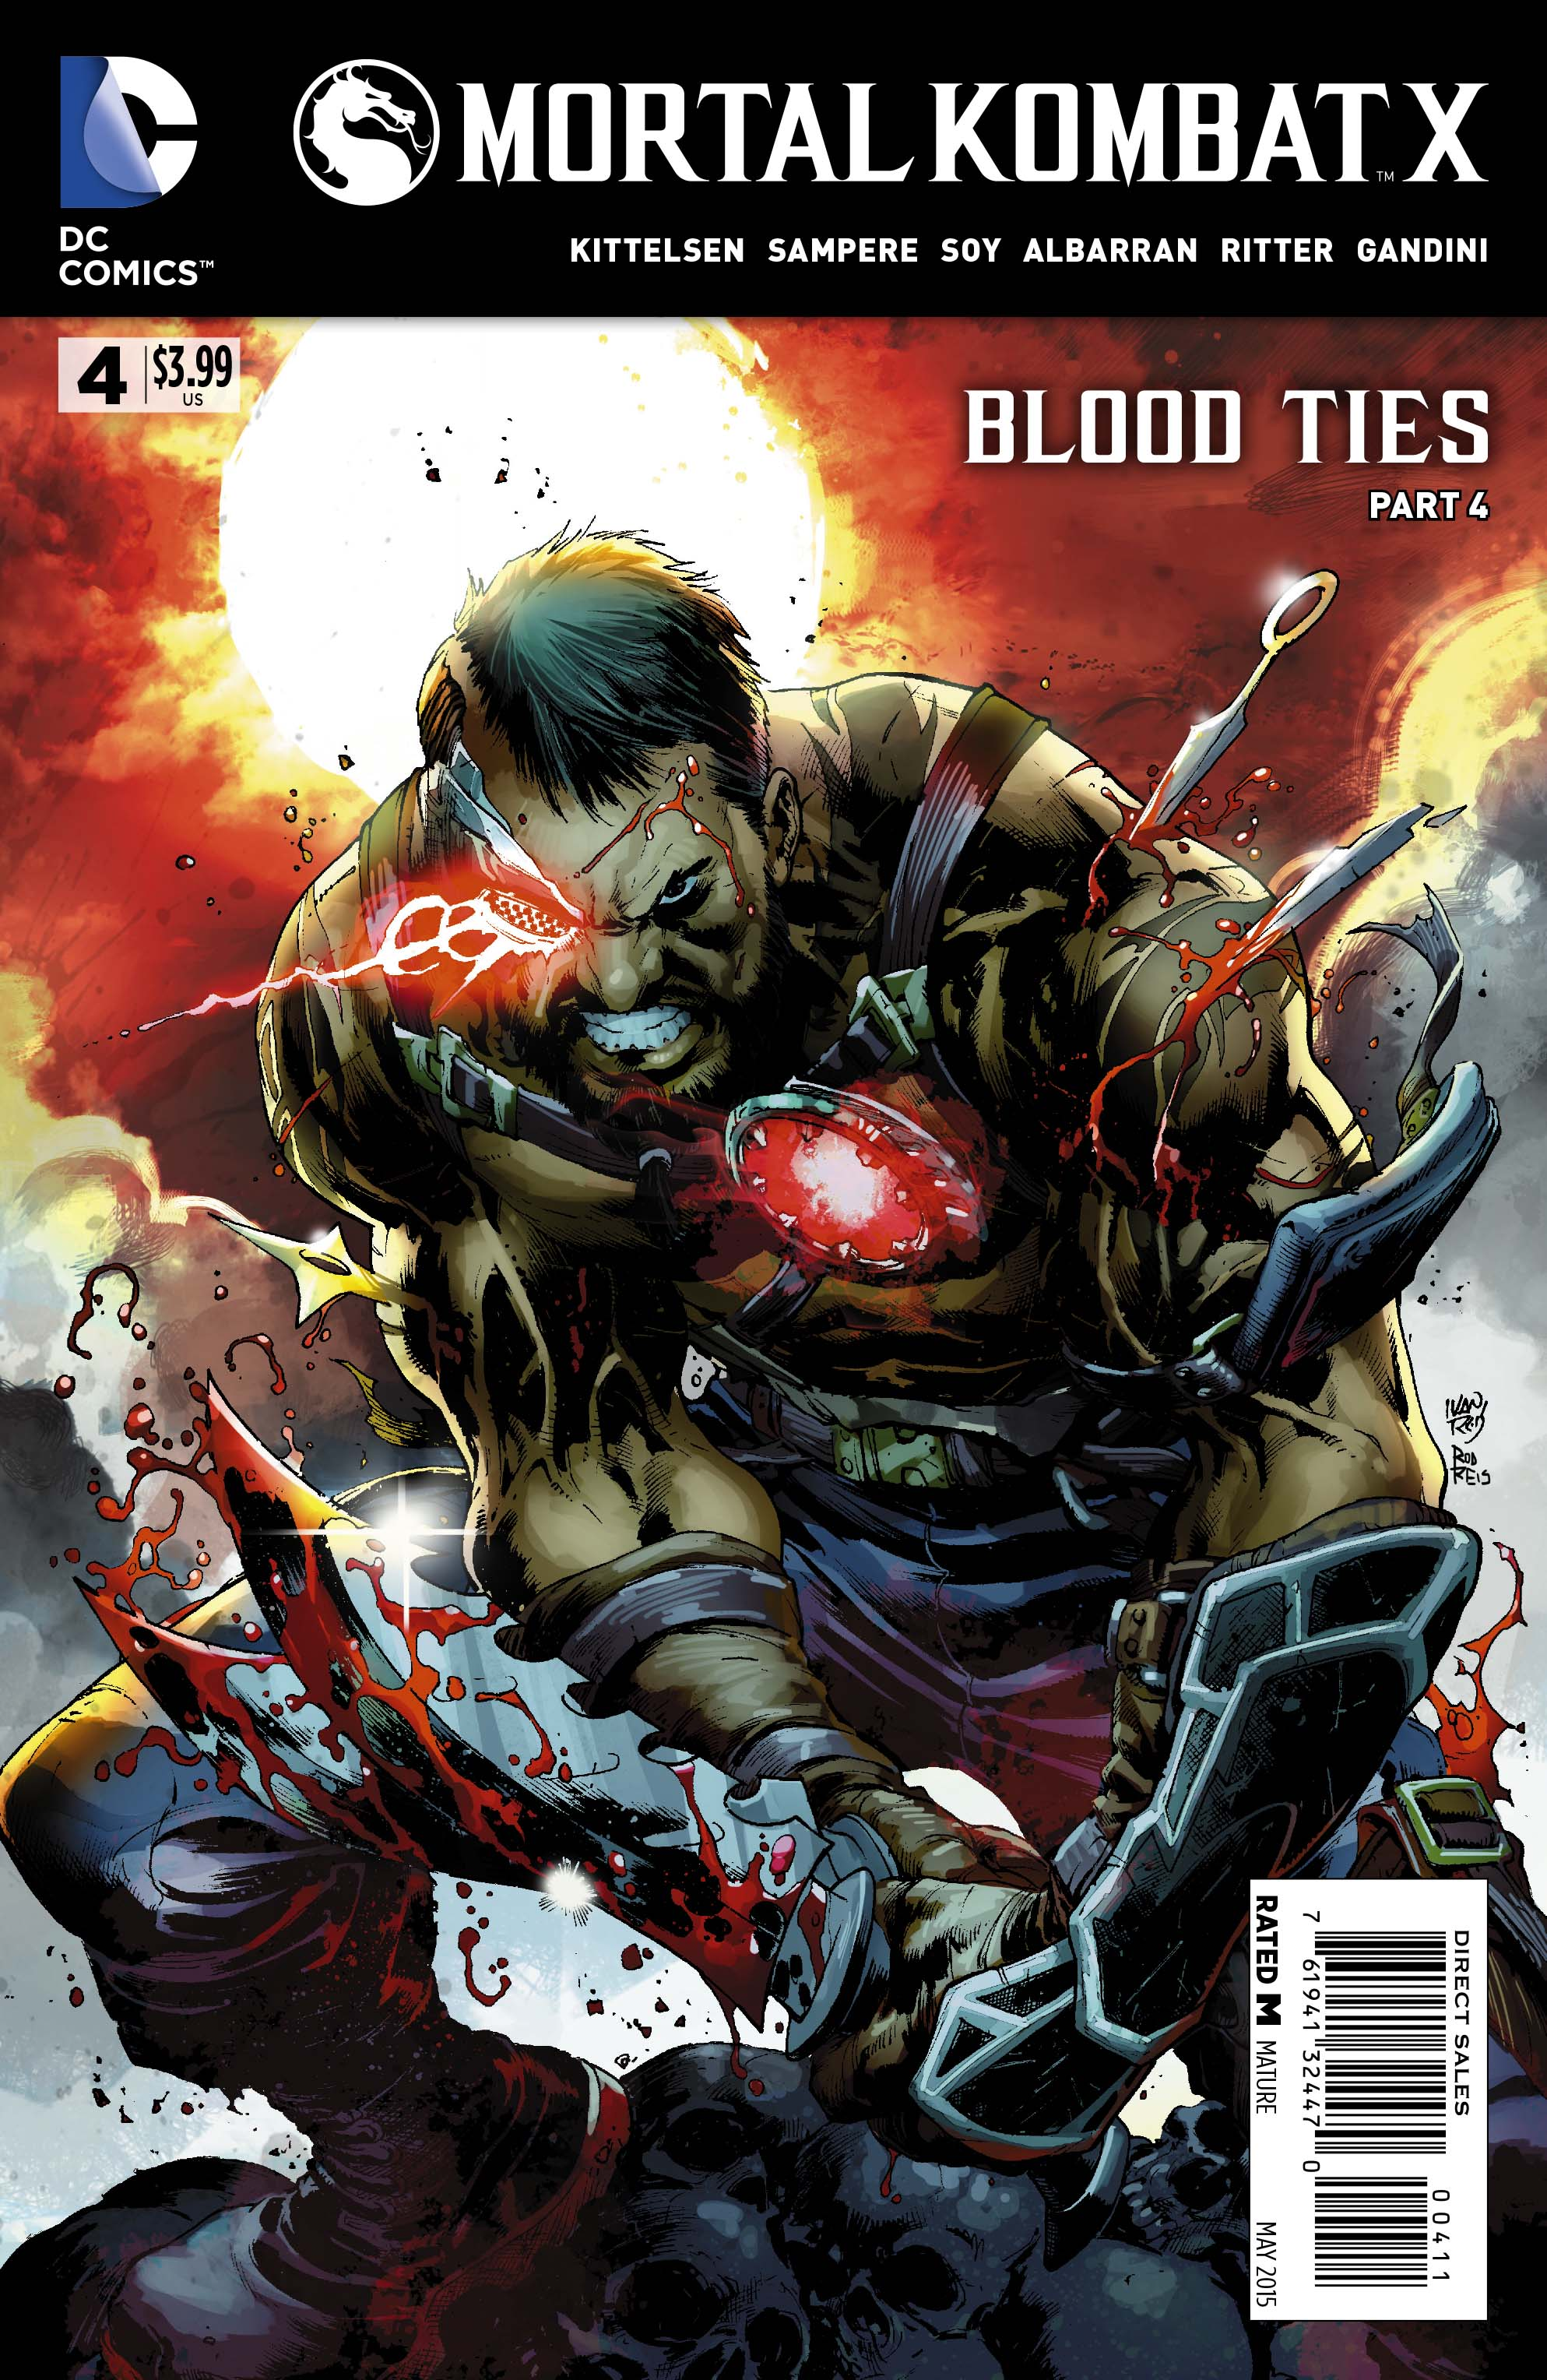 EXCLUSIVE Preview: MORTAL KOMBAT X #4 | 13th Dimension